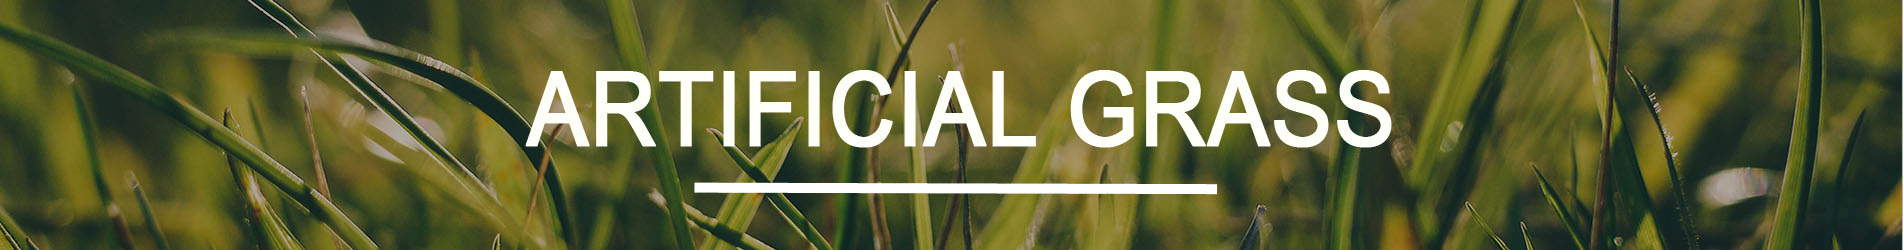 European_Artificial_Grass